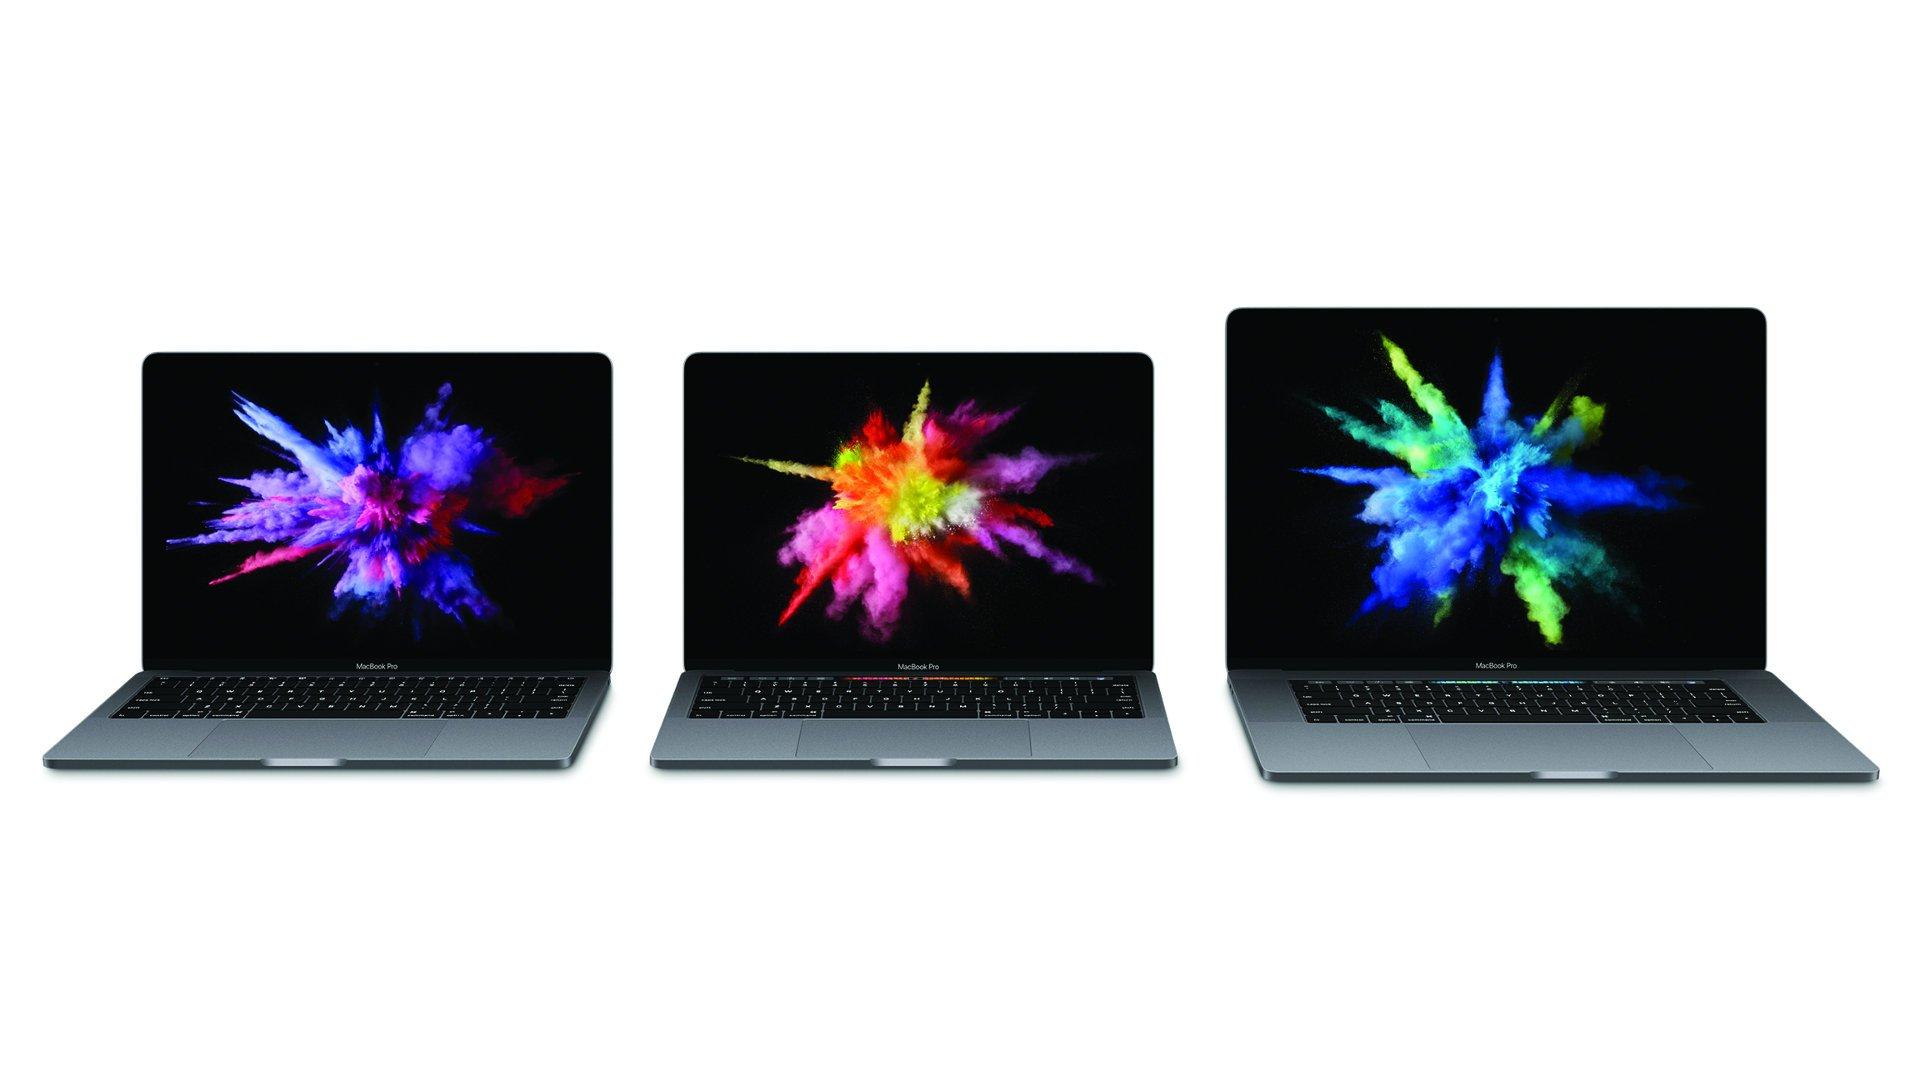 MacBook Pro 2017 Rumors